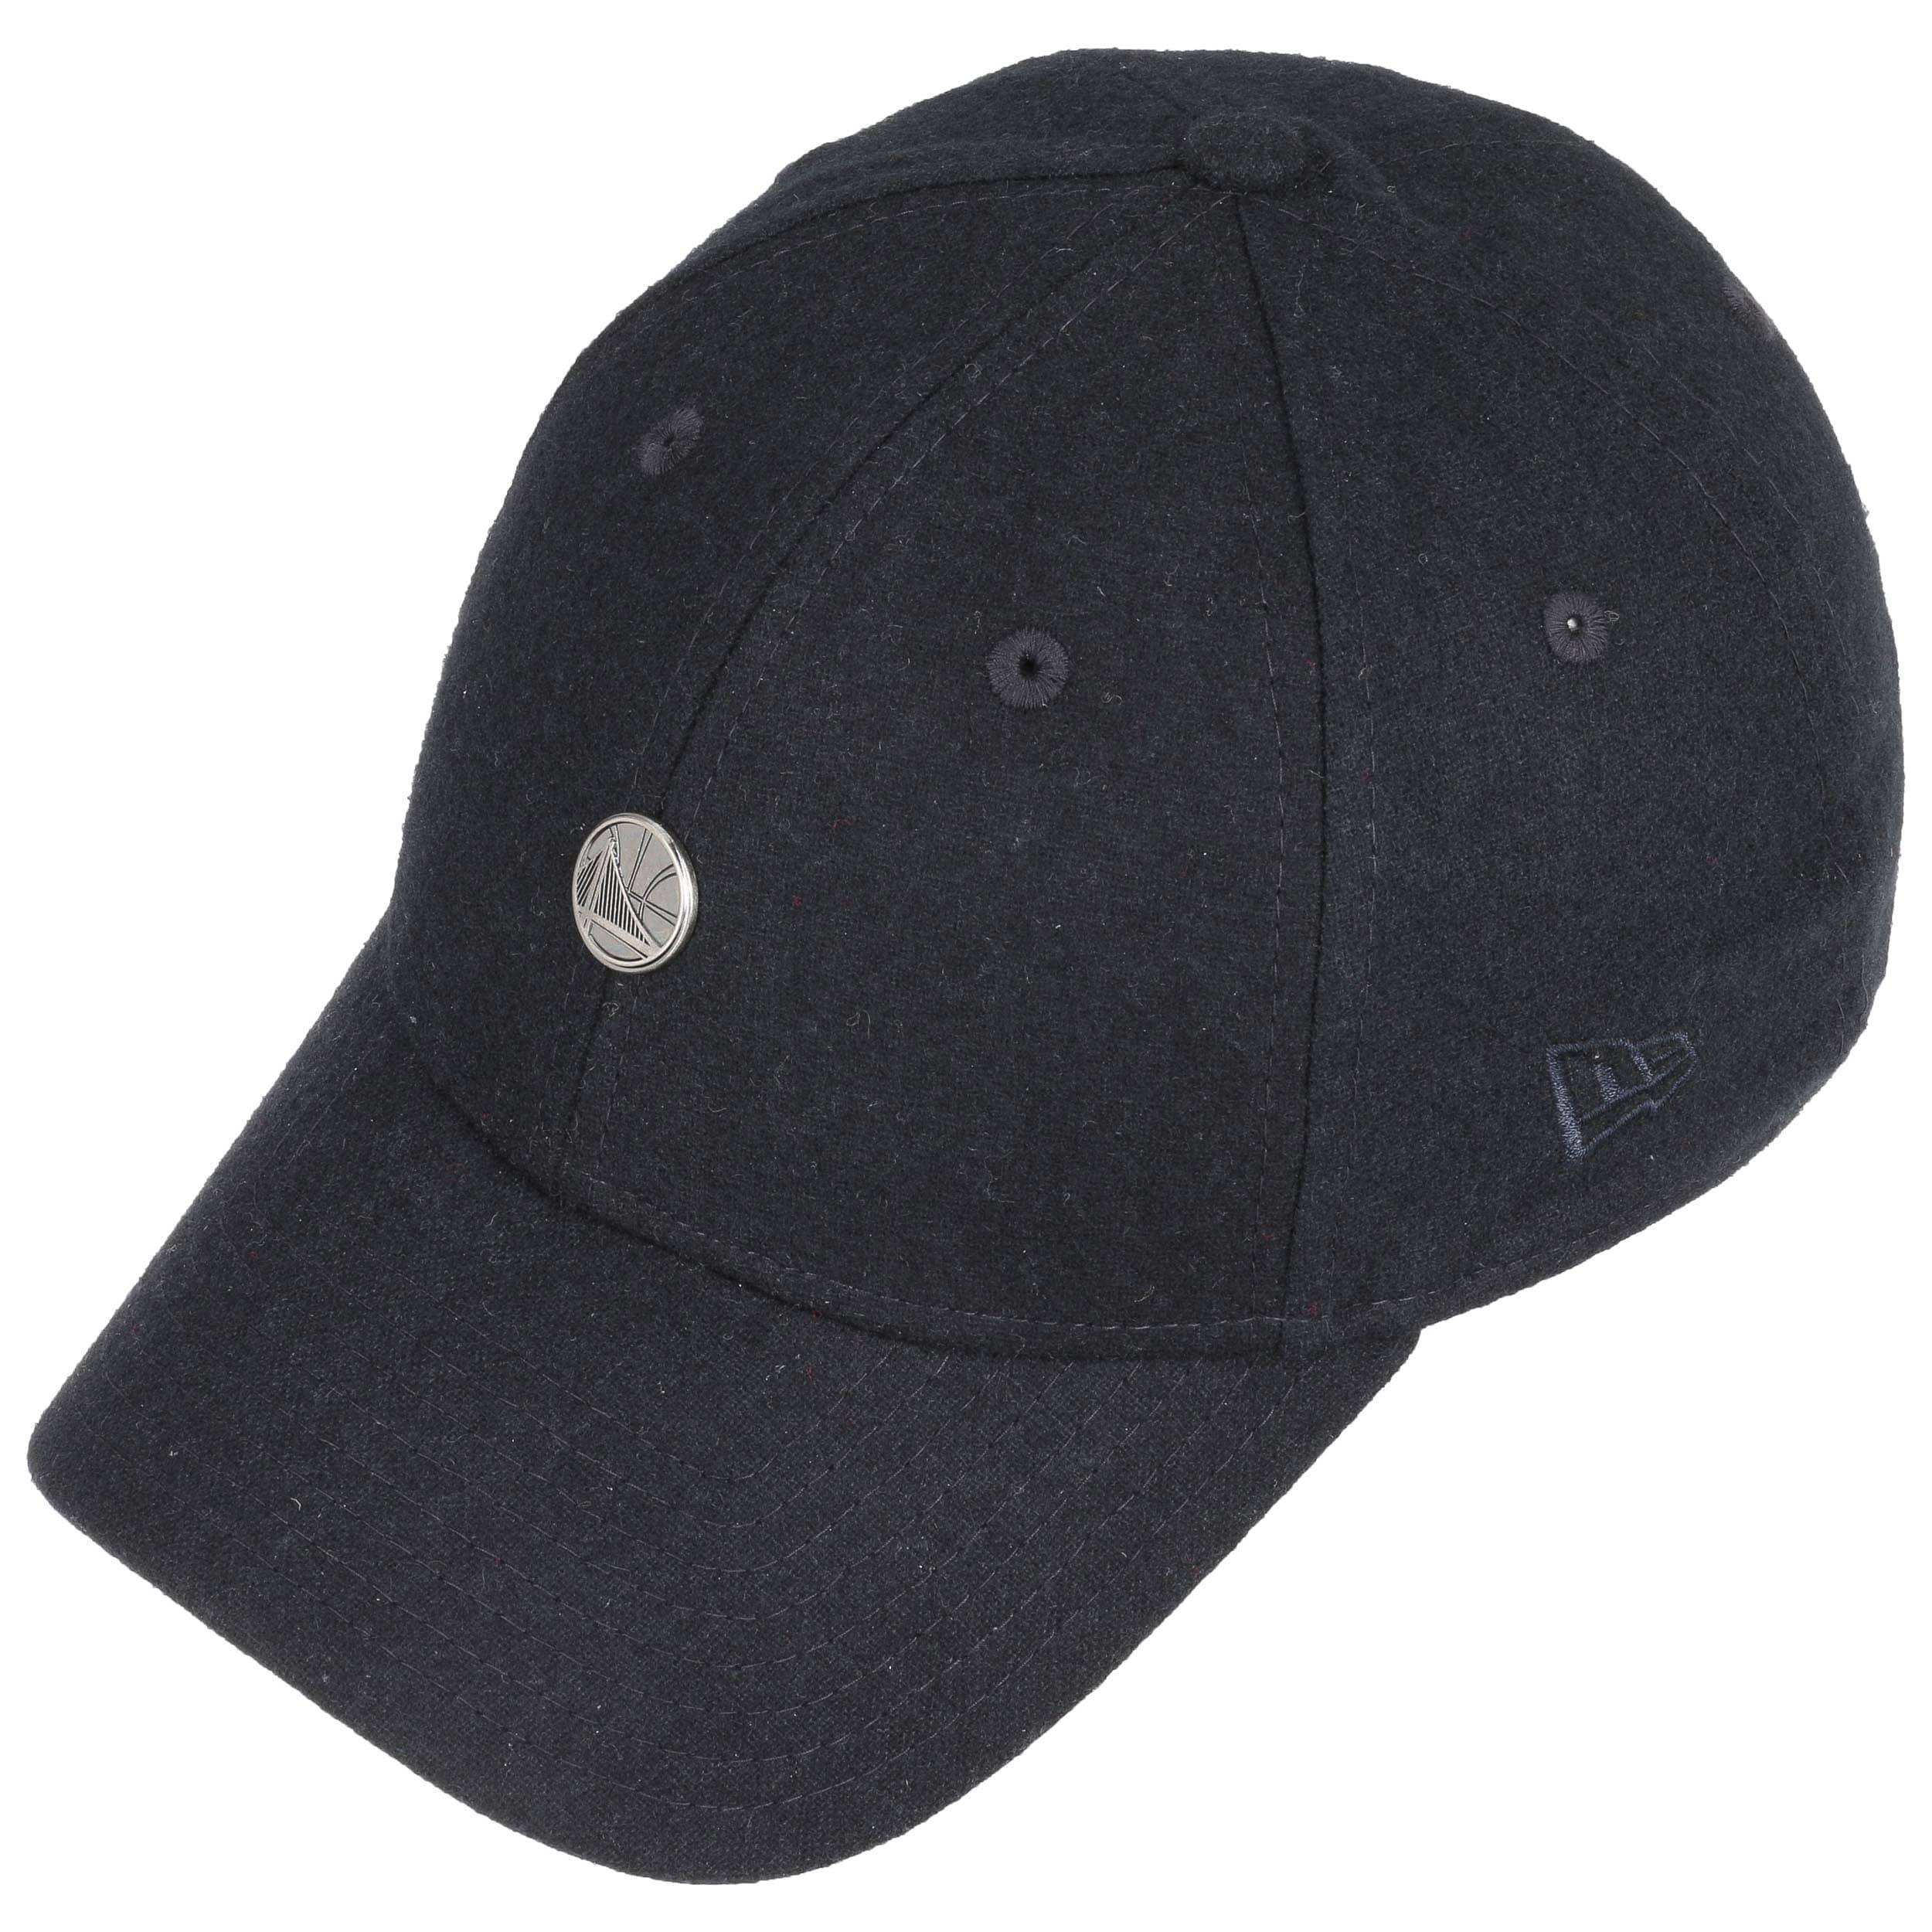 233e859e2b3 9Forty Pin Warriors Cap by New Era - navy 1 ...